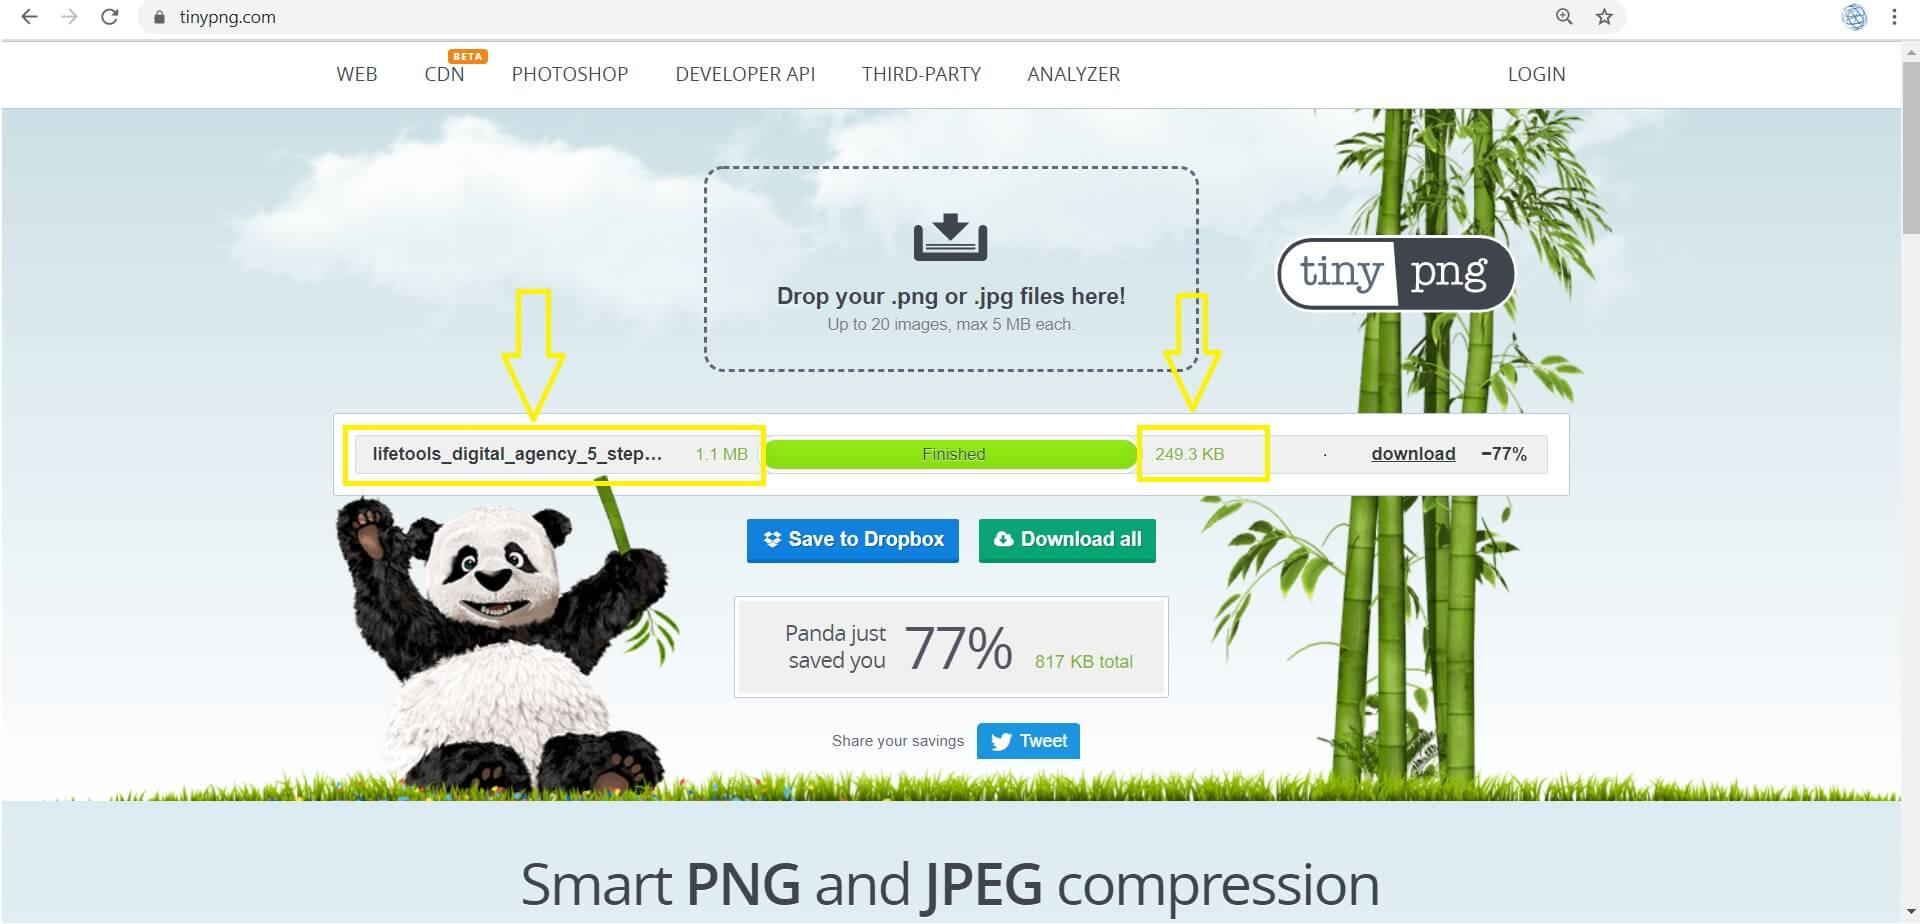 lifetools_digital_agency_compression_demo